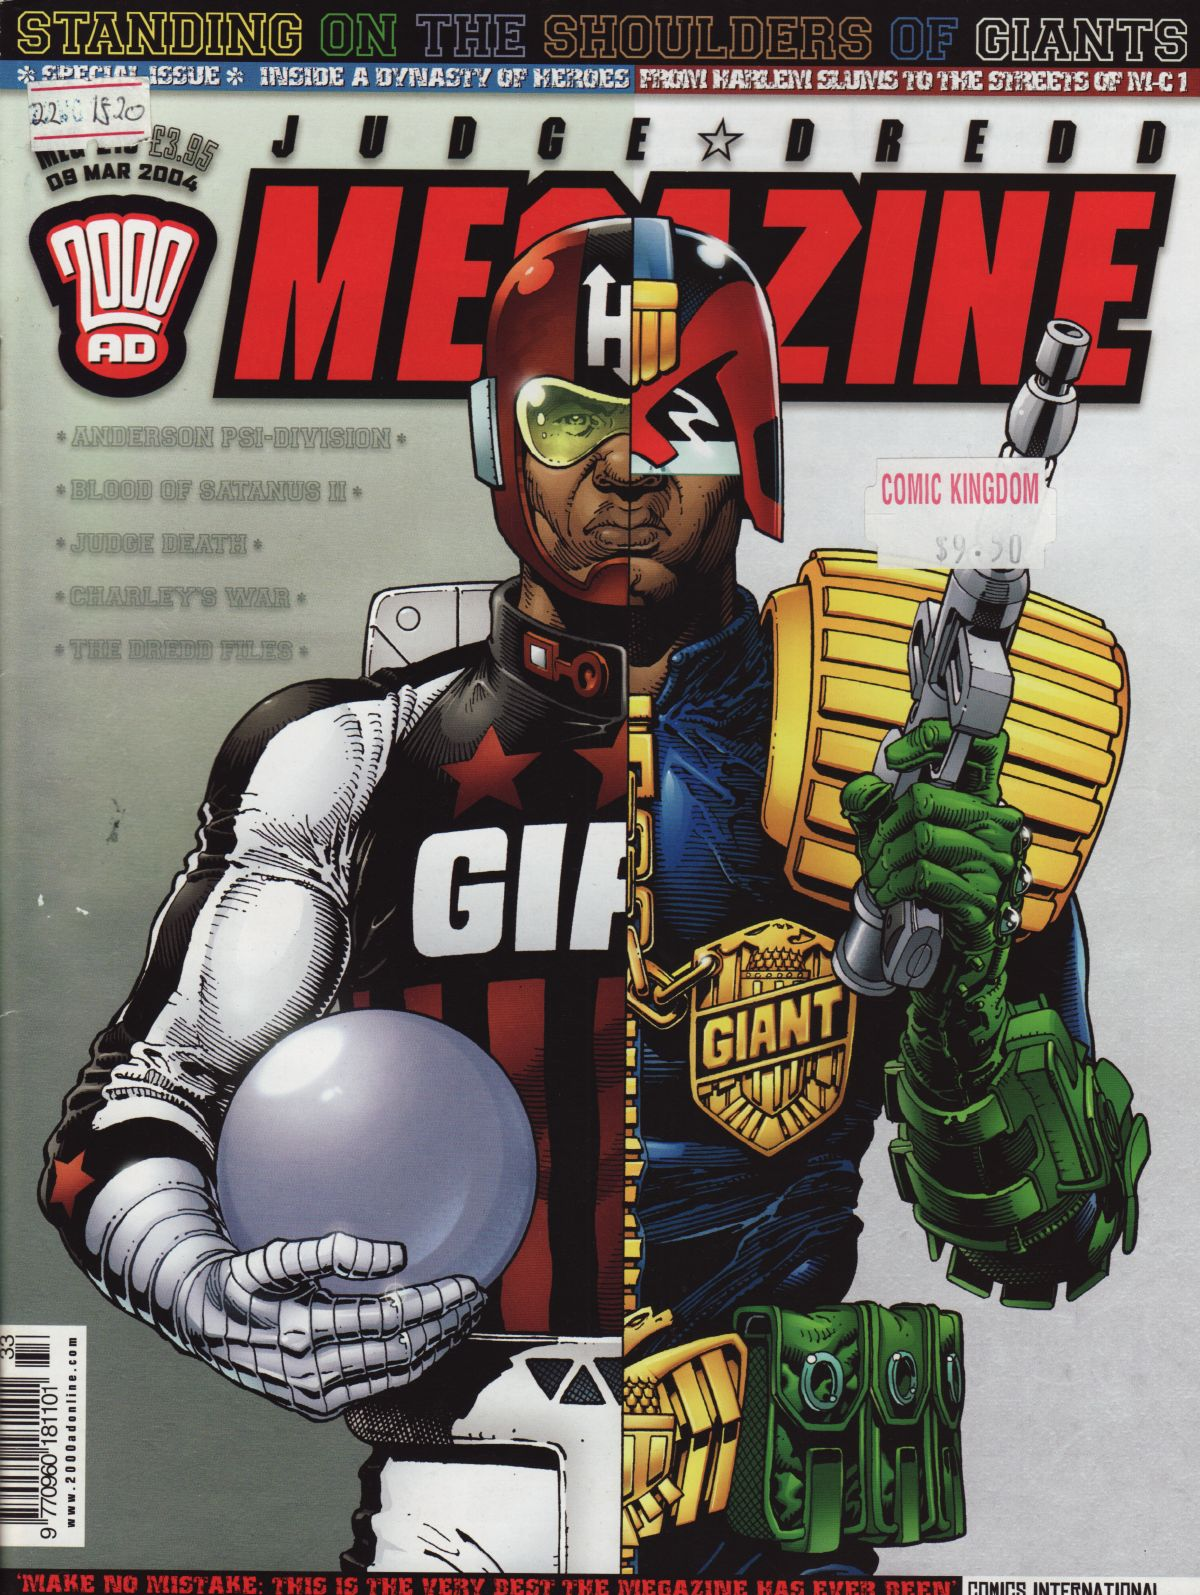 Judge Dredd Megazine (Vol. 5) issue 216 - Page 1